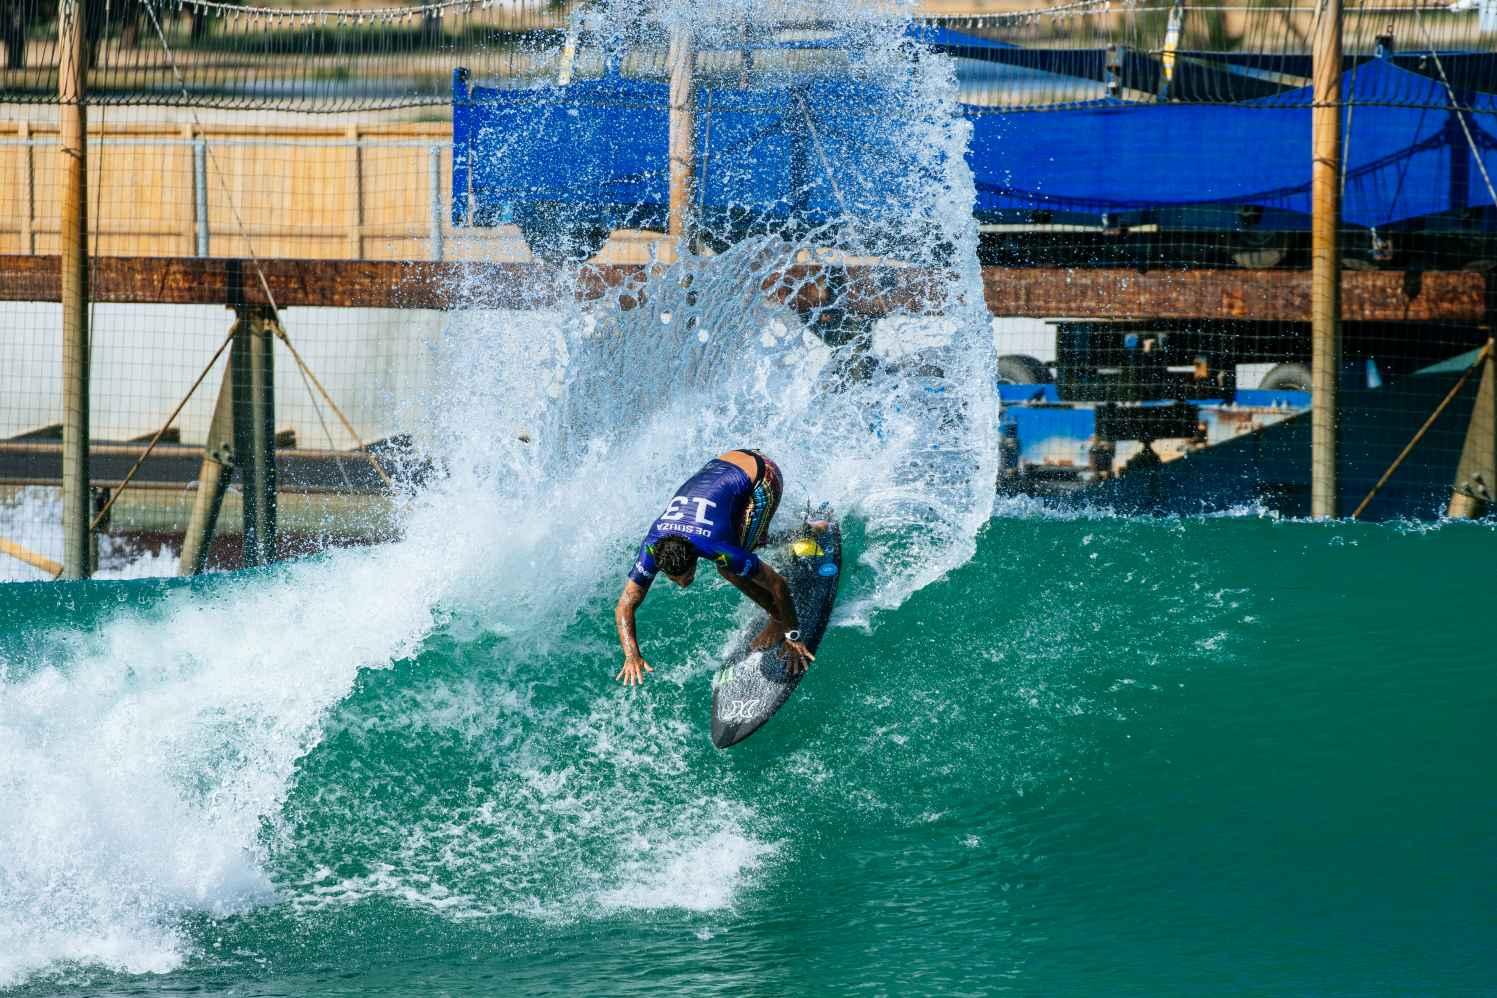 surf30 surf ranch pro 2021 wsl surf Toledo F Ranch21 PNN 6871